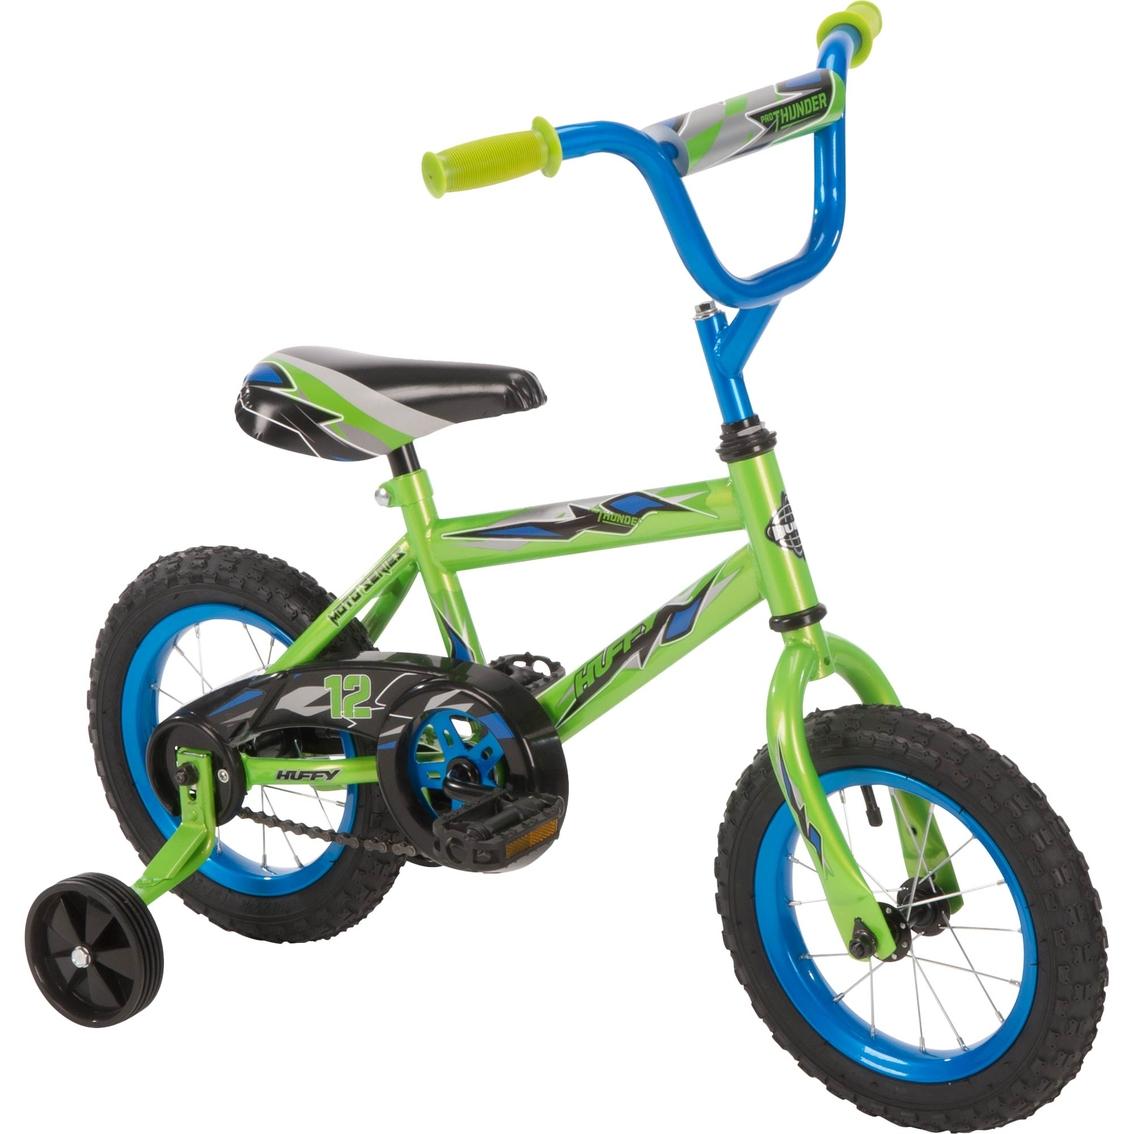 Target Riding Toys For Boys : Huffy pro thunder in bike kids bikes sports